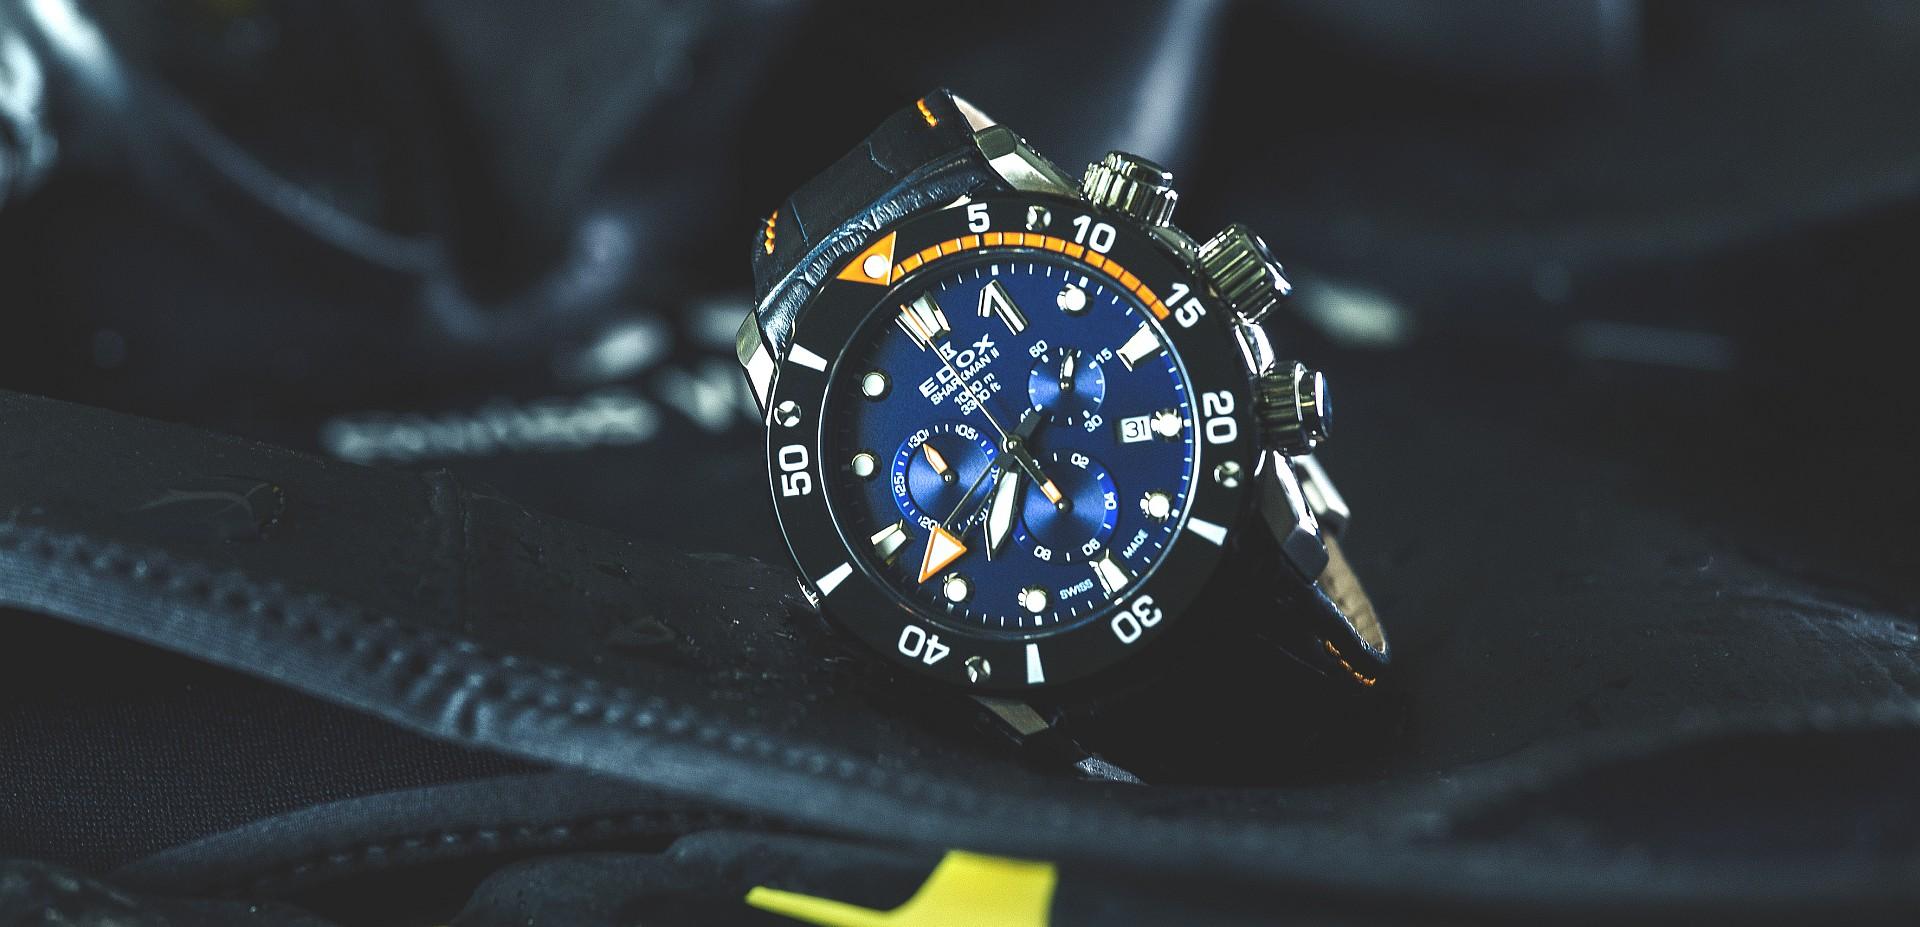 Edox Sharkman II腕錶將陪同冰人Christian Redl改寫冰下自由潛水新紀錄